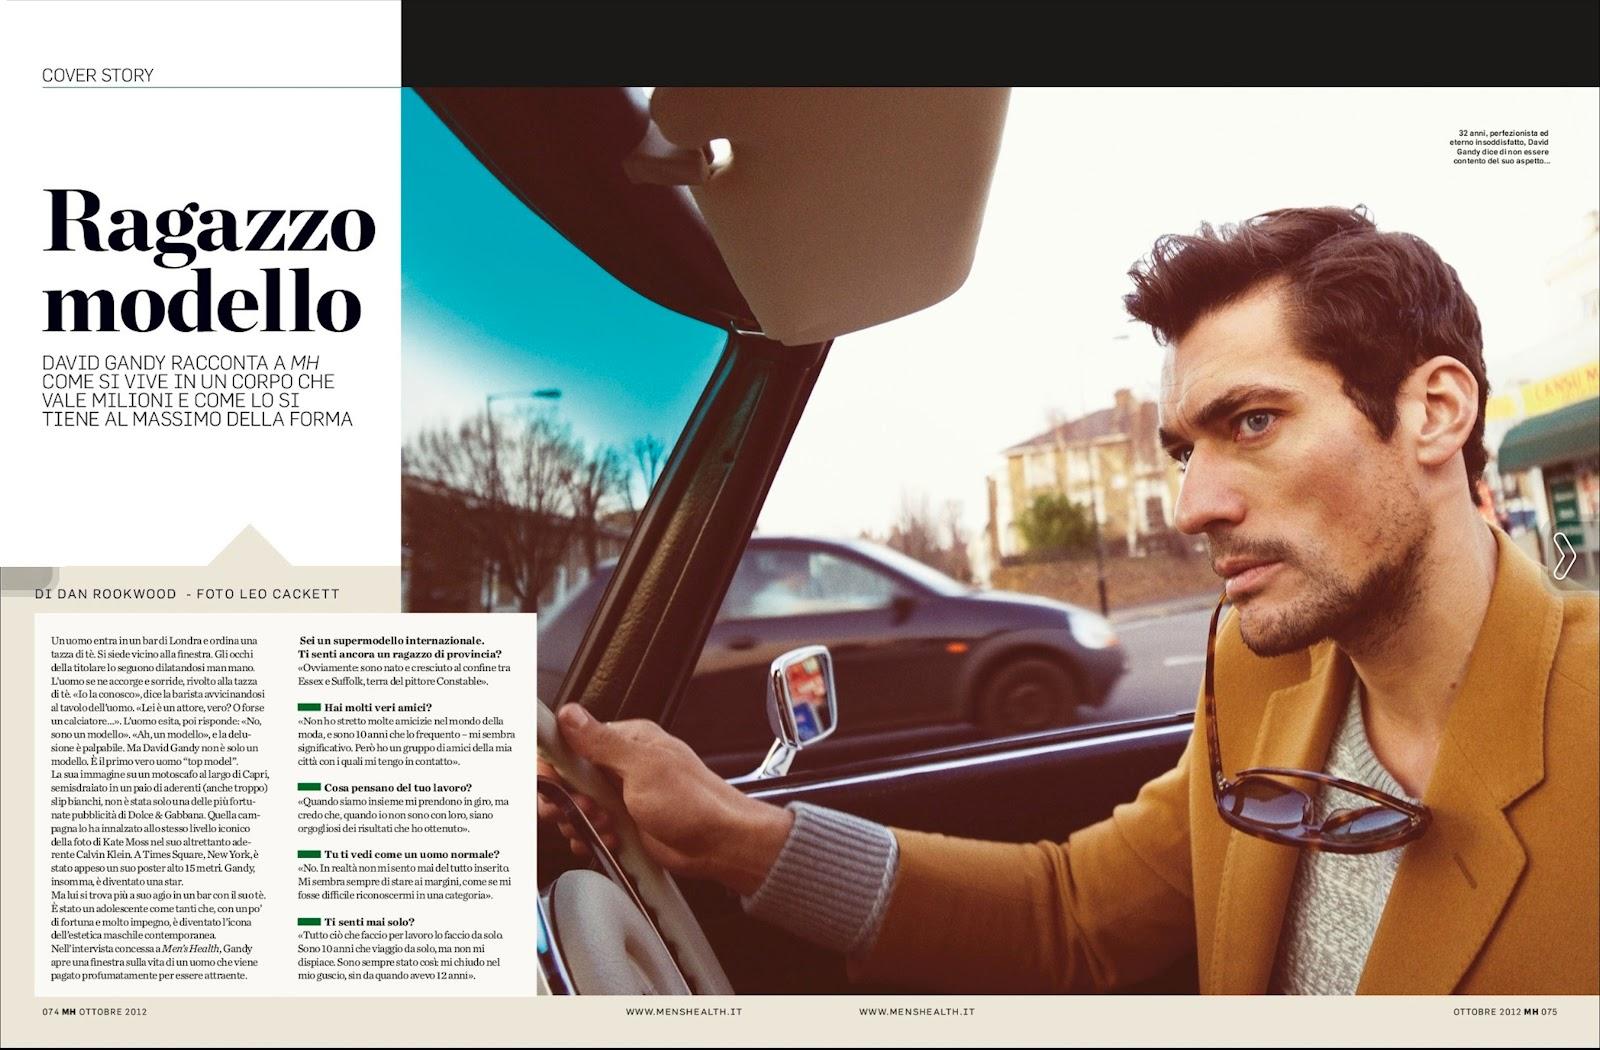 http://2.bp.blogspot.com/-PqmILZltna0/UGyK5YL0aZI/AAAAAAAAAVk/WpfJ-JXnxaA/s1600/Men%27s+Health+Italy_Oct+2012_01.jpg